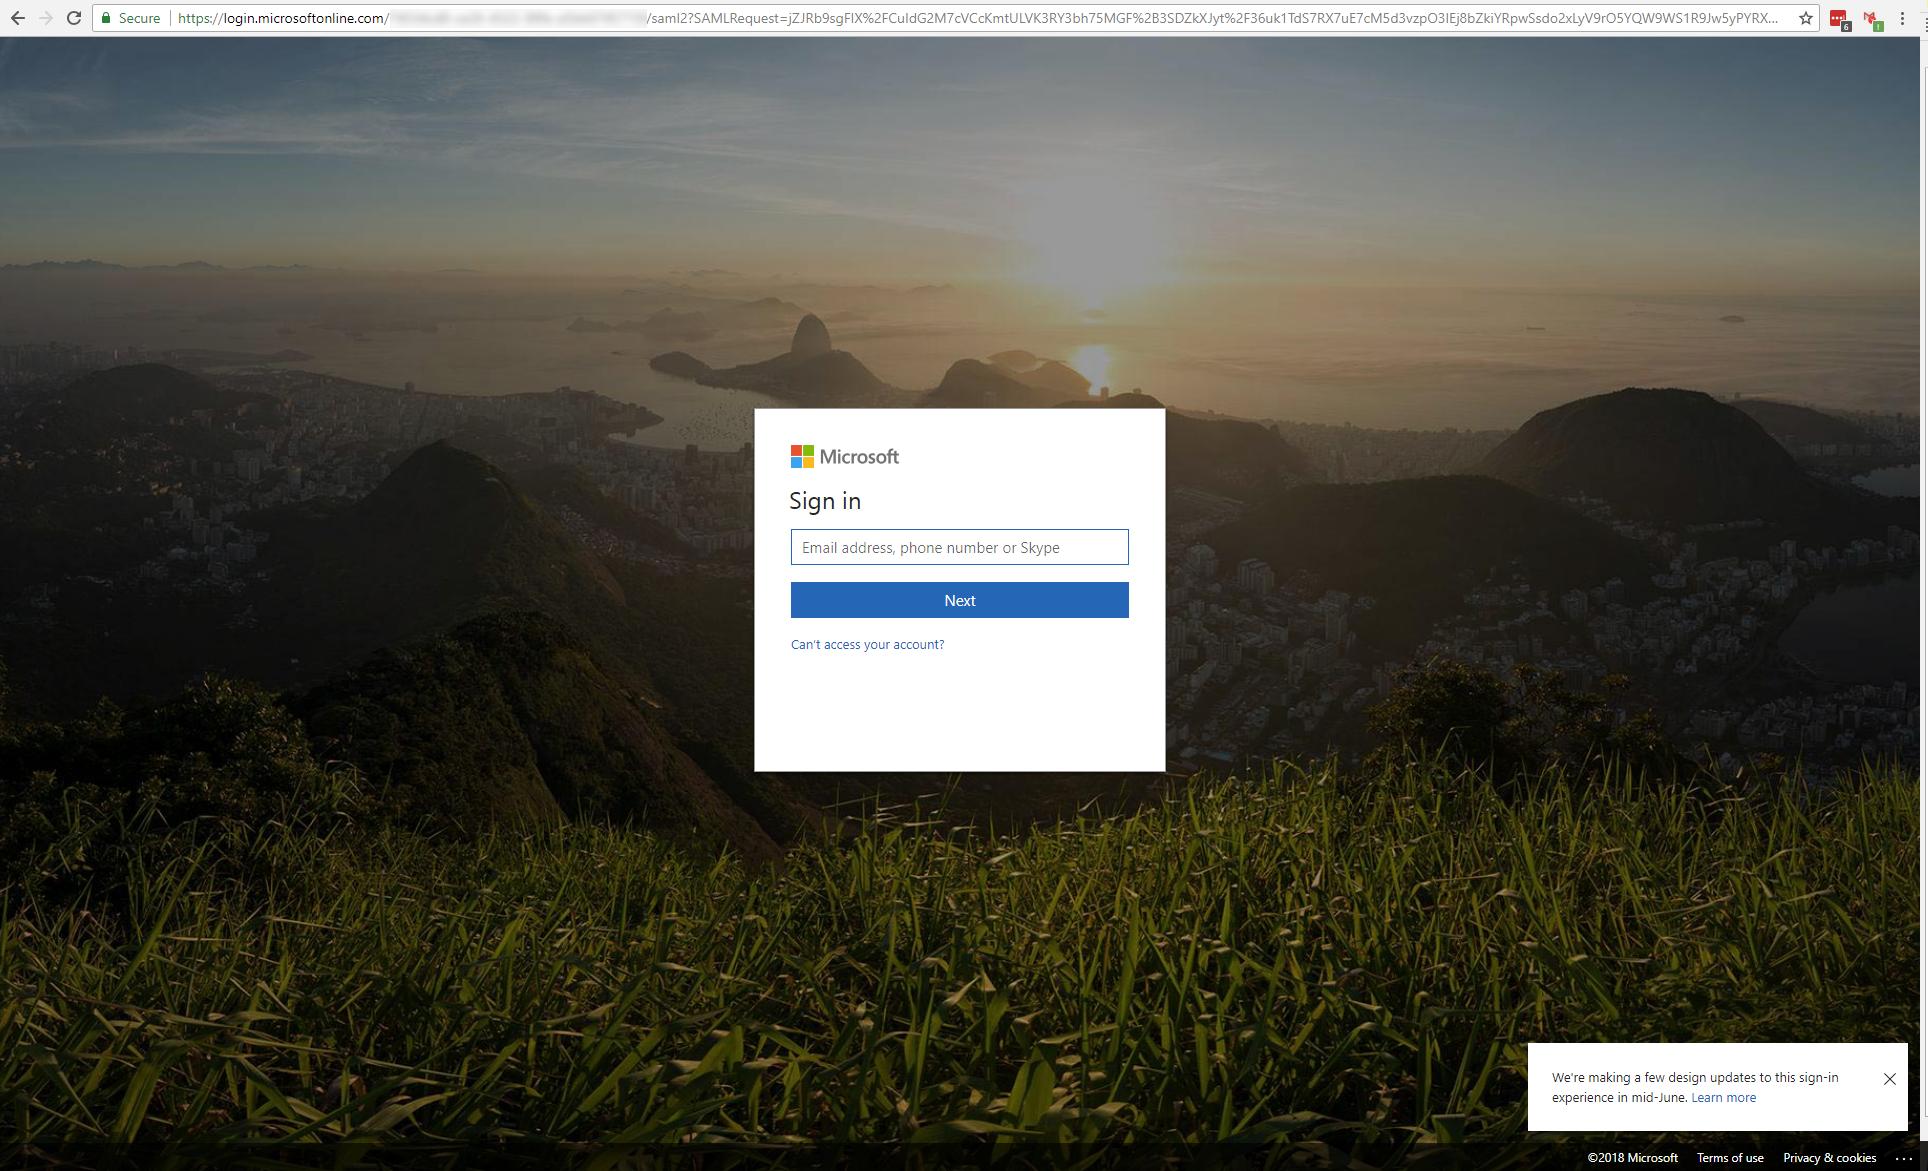 Microsoft sign in